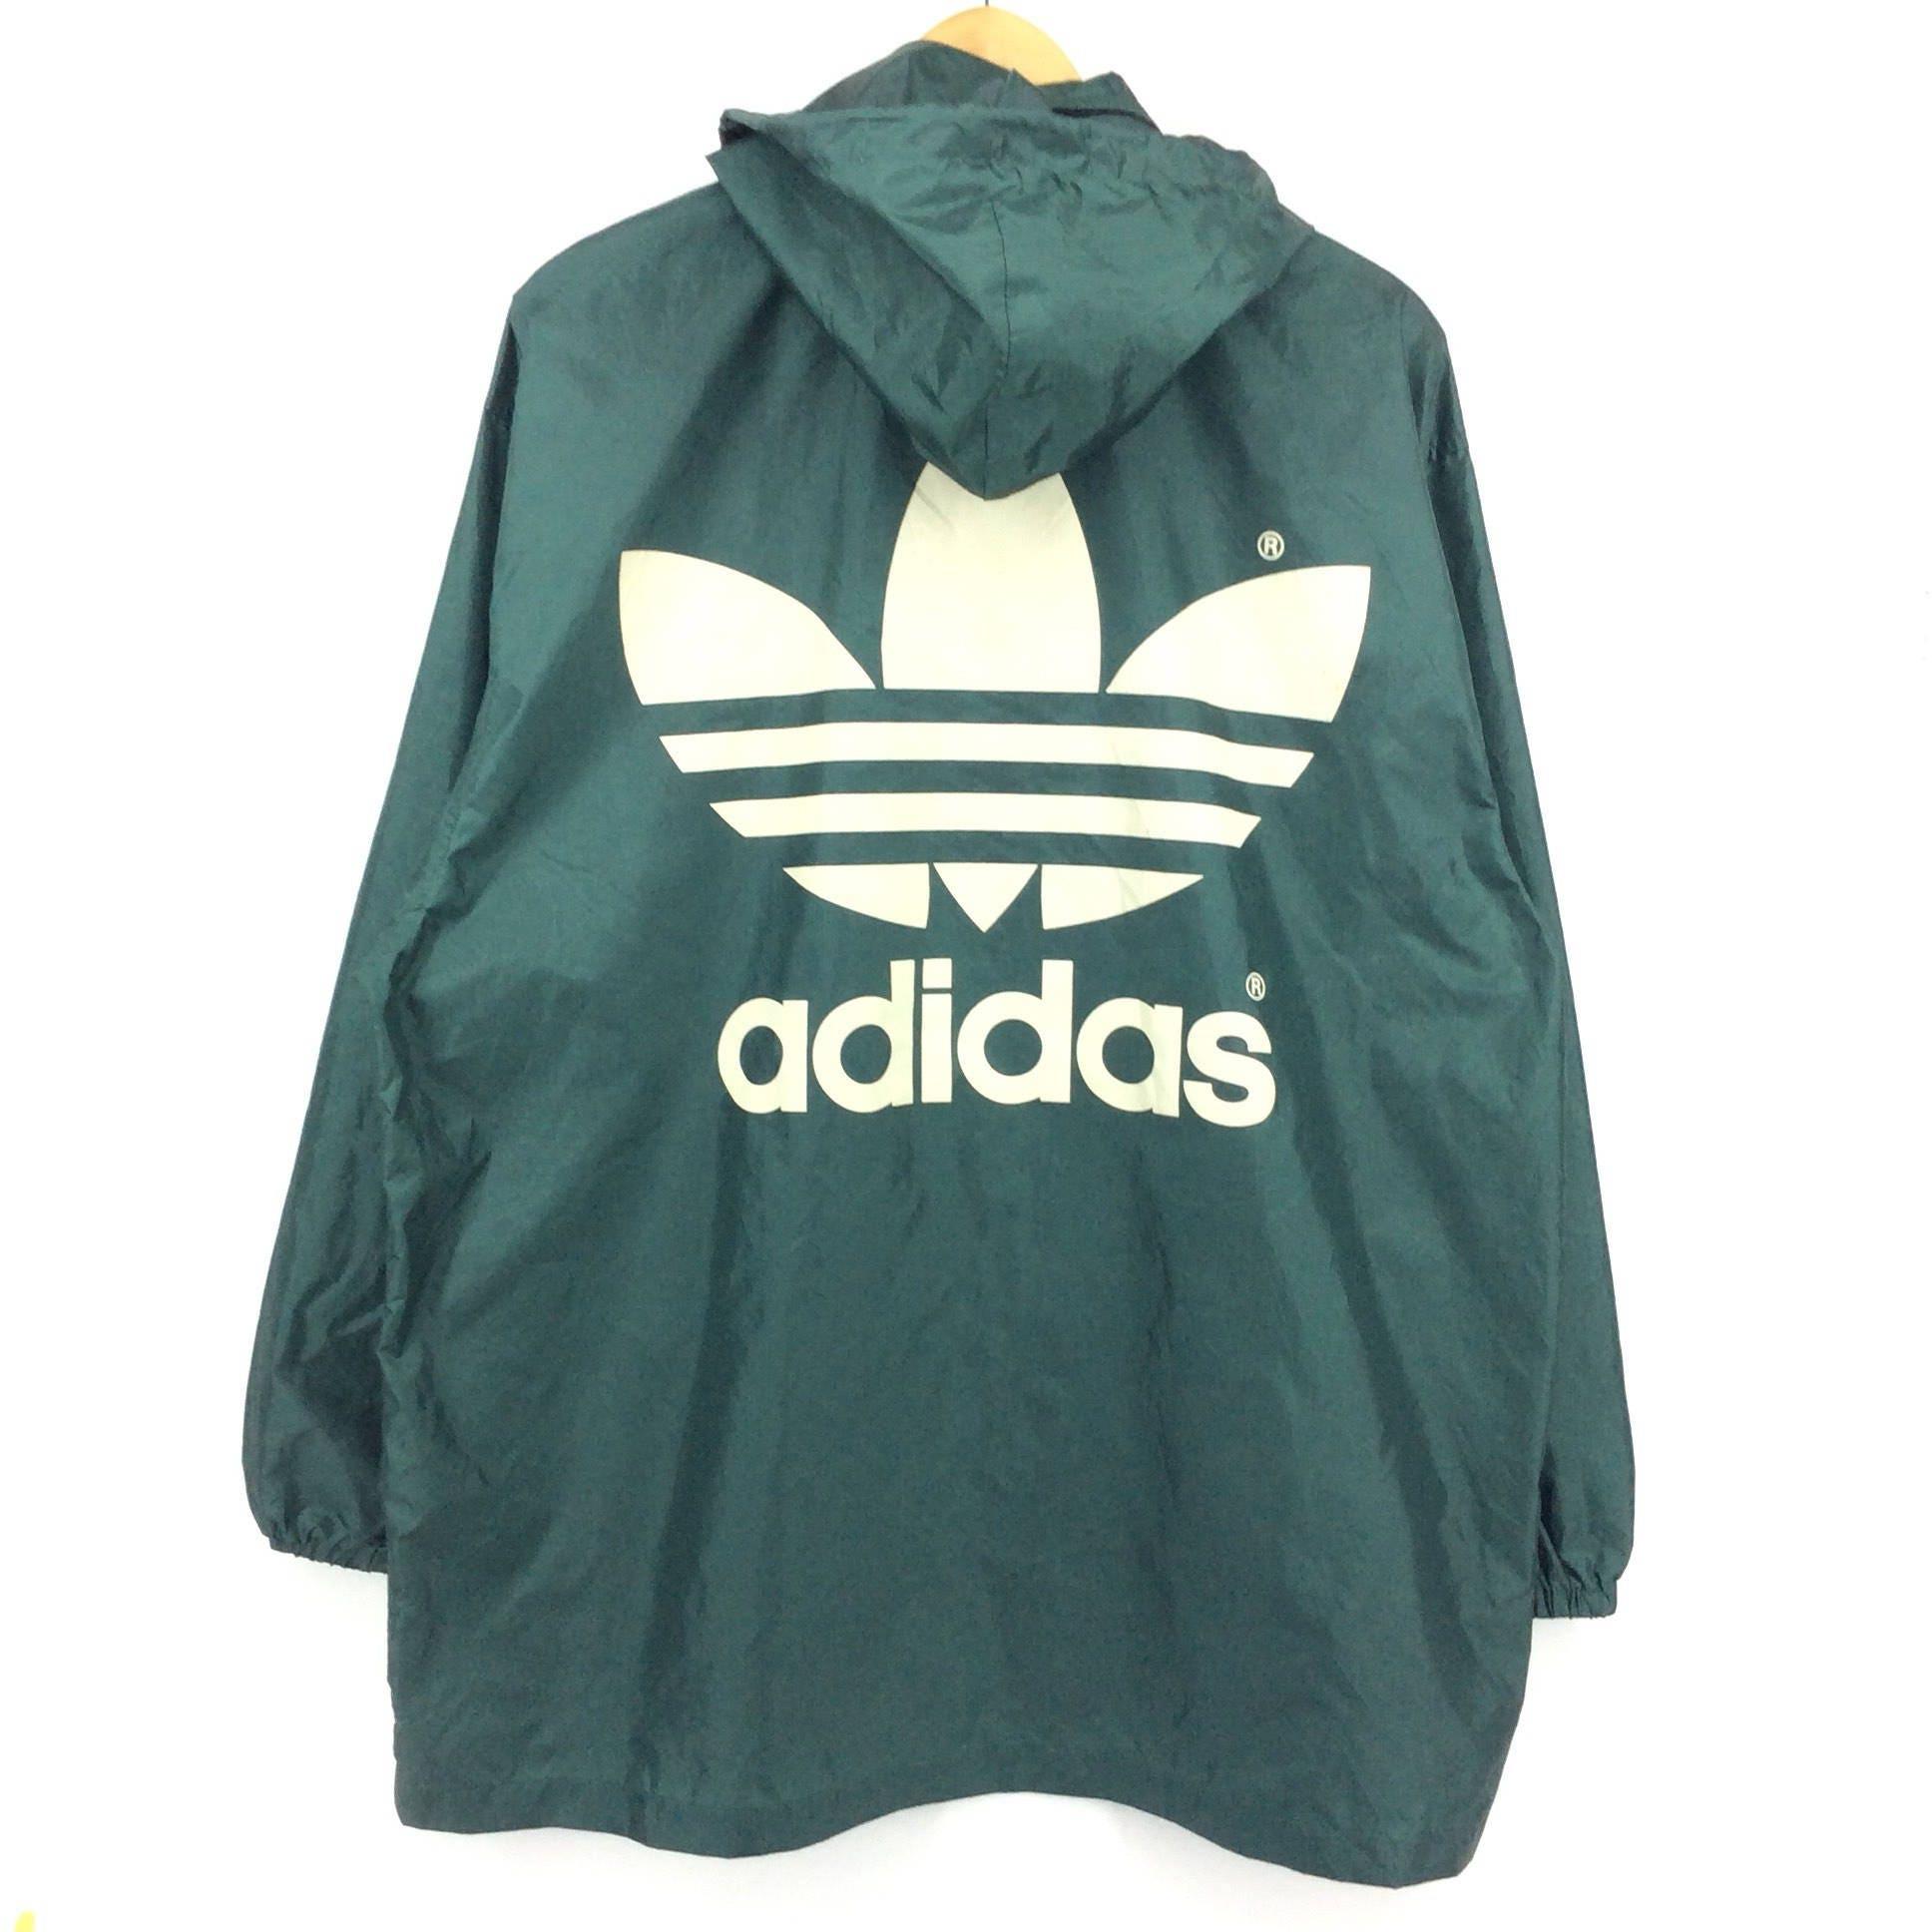 391feaa27d1bc Vintage Adidas Windbreaker Jacket Big Logo Spellout / Adidas Bomber Jacket  / Green and White Retro Fashion Rap Tees Hip Hop Swag